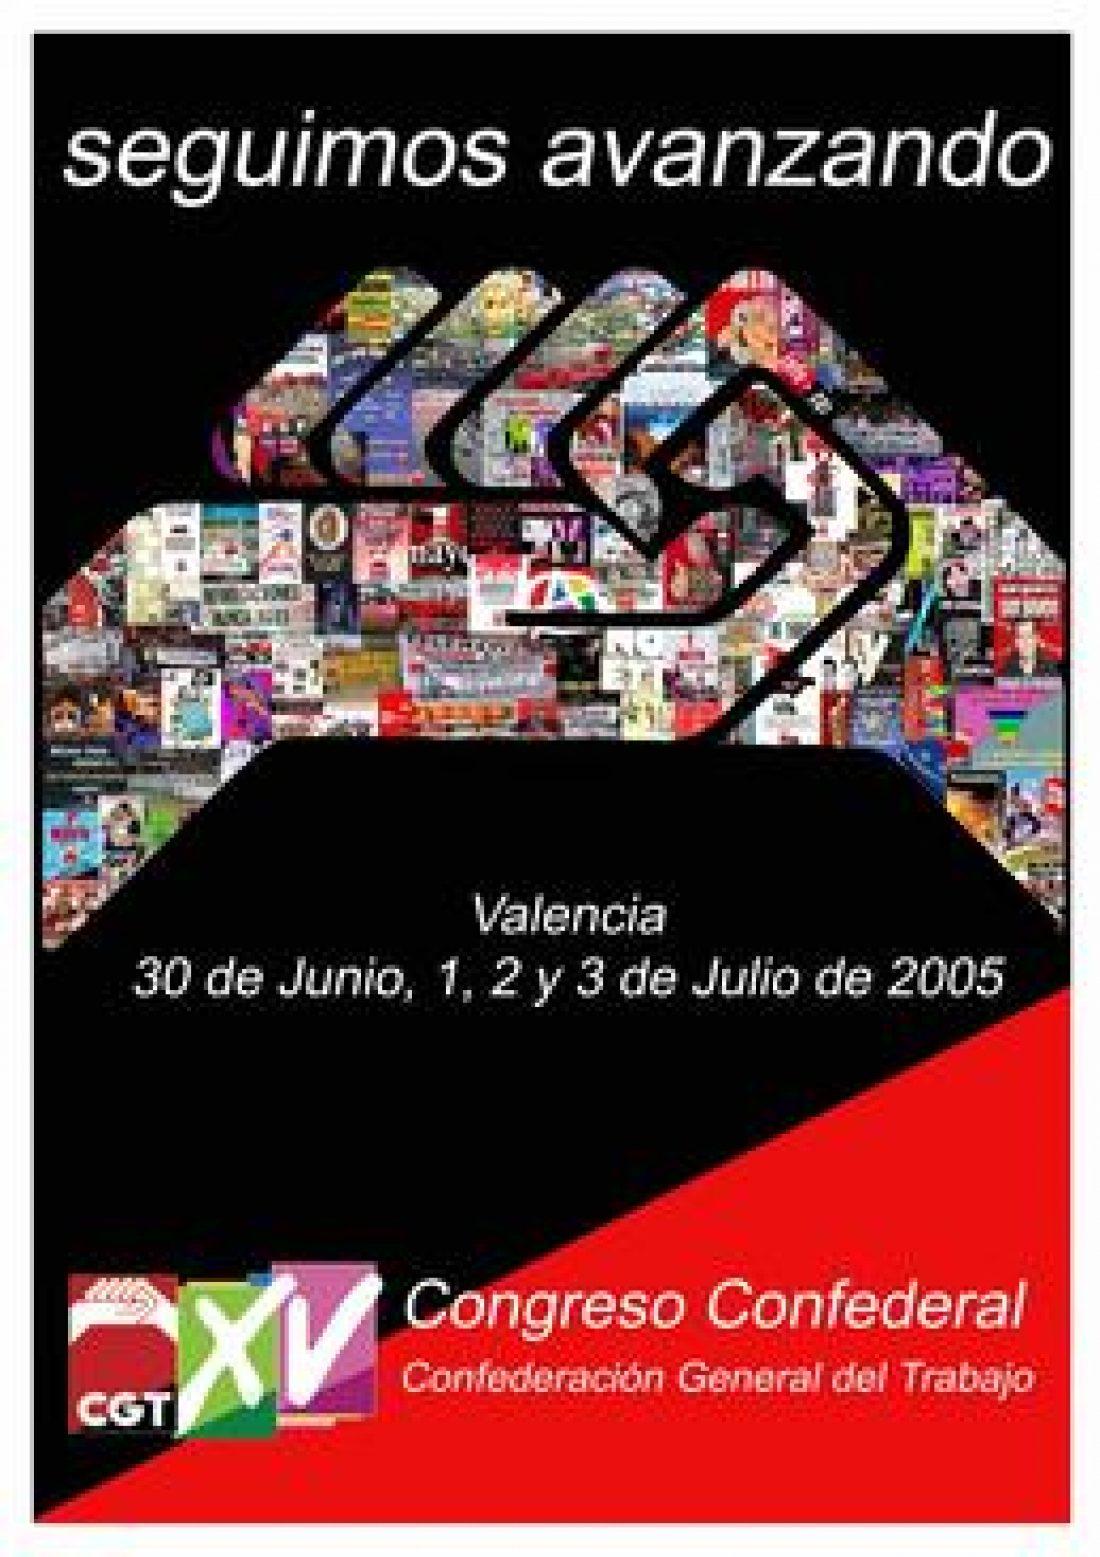 XV Congreso Confederal